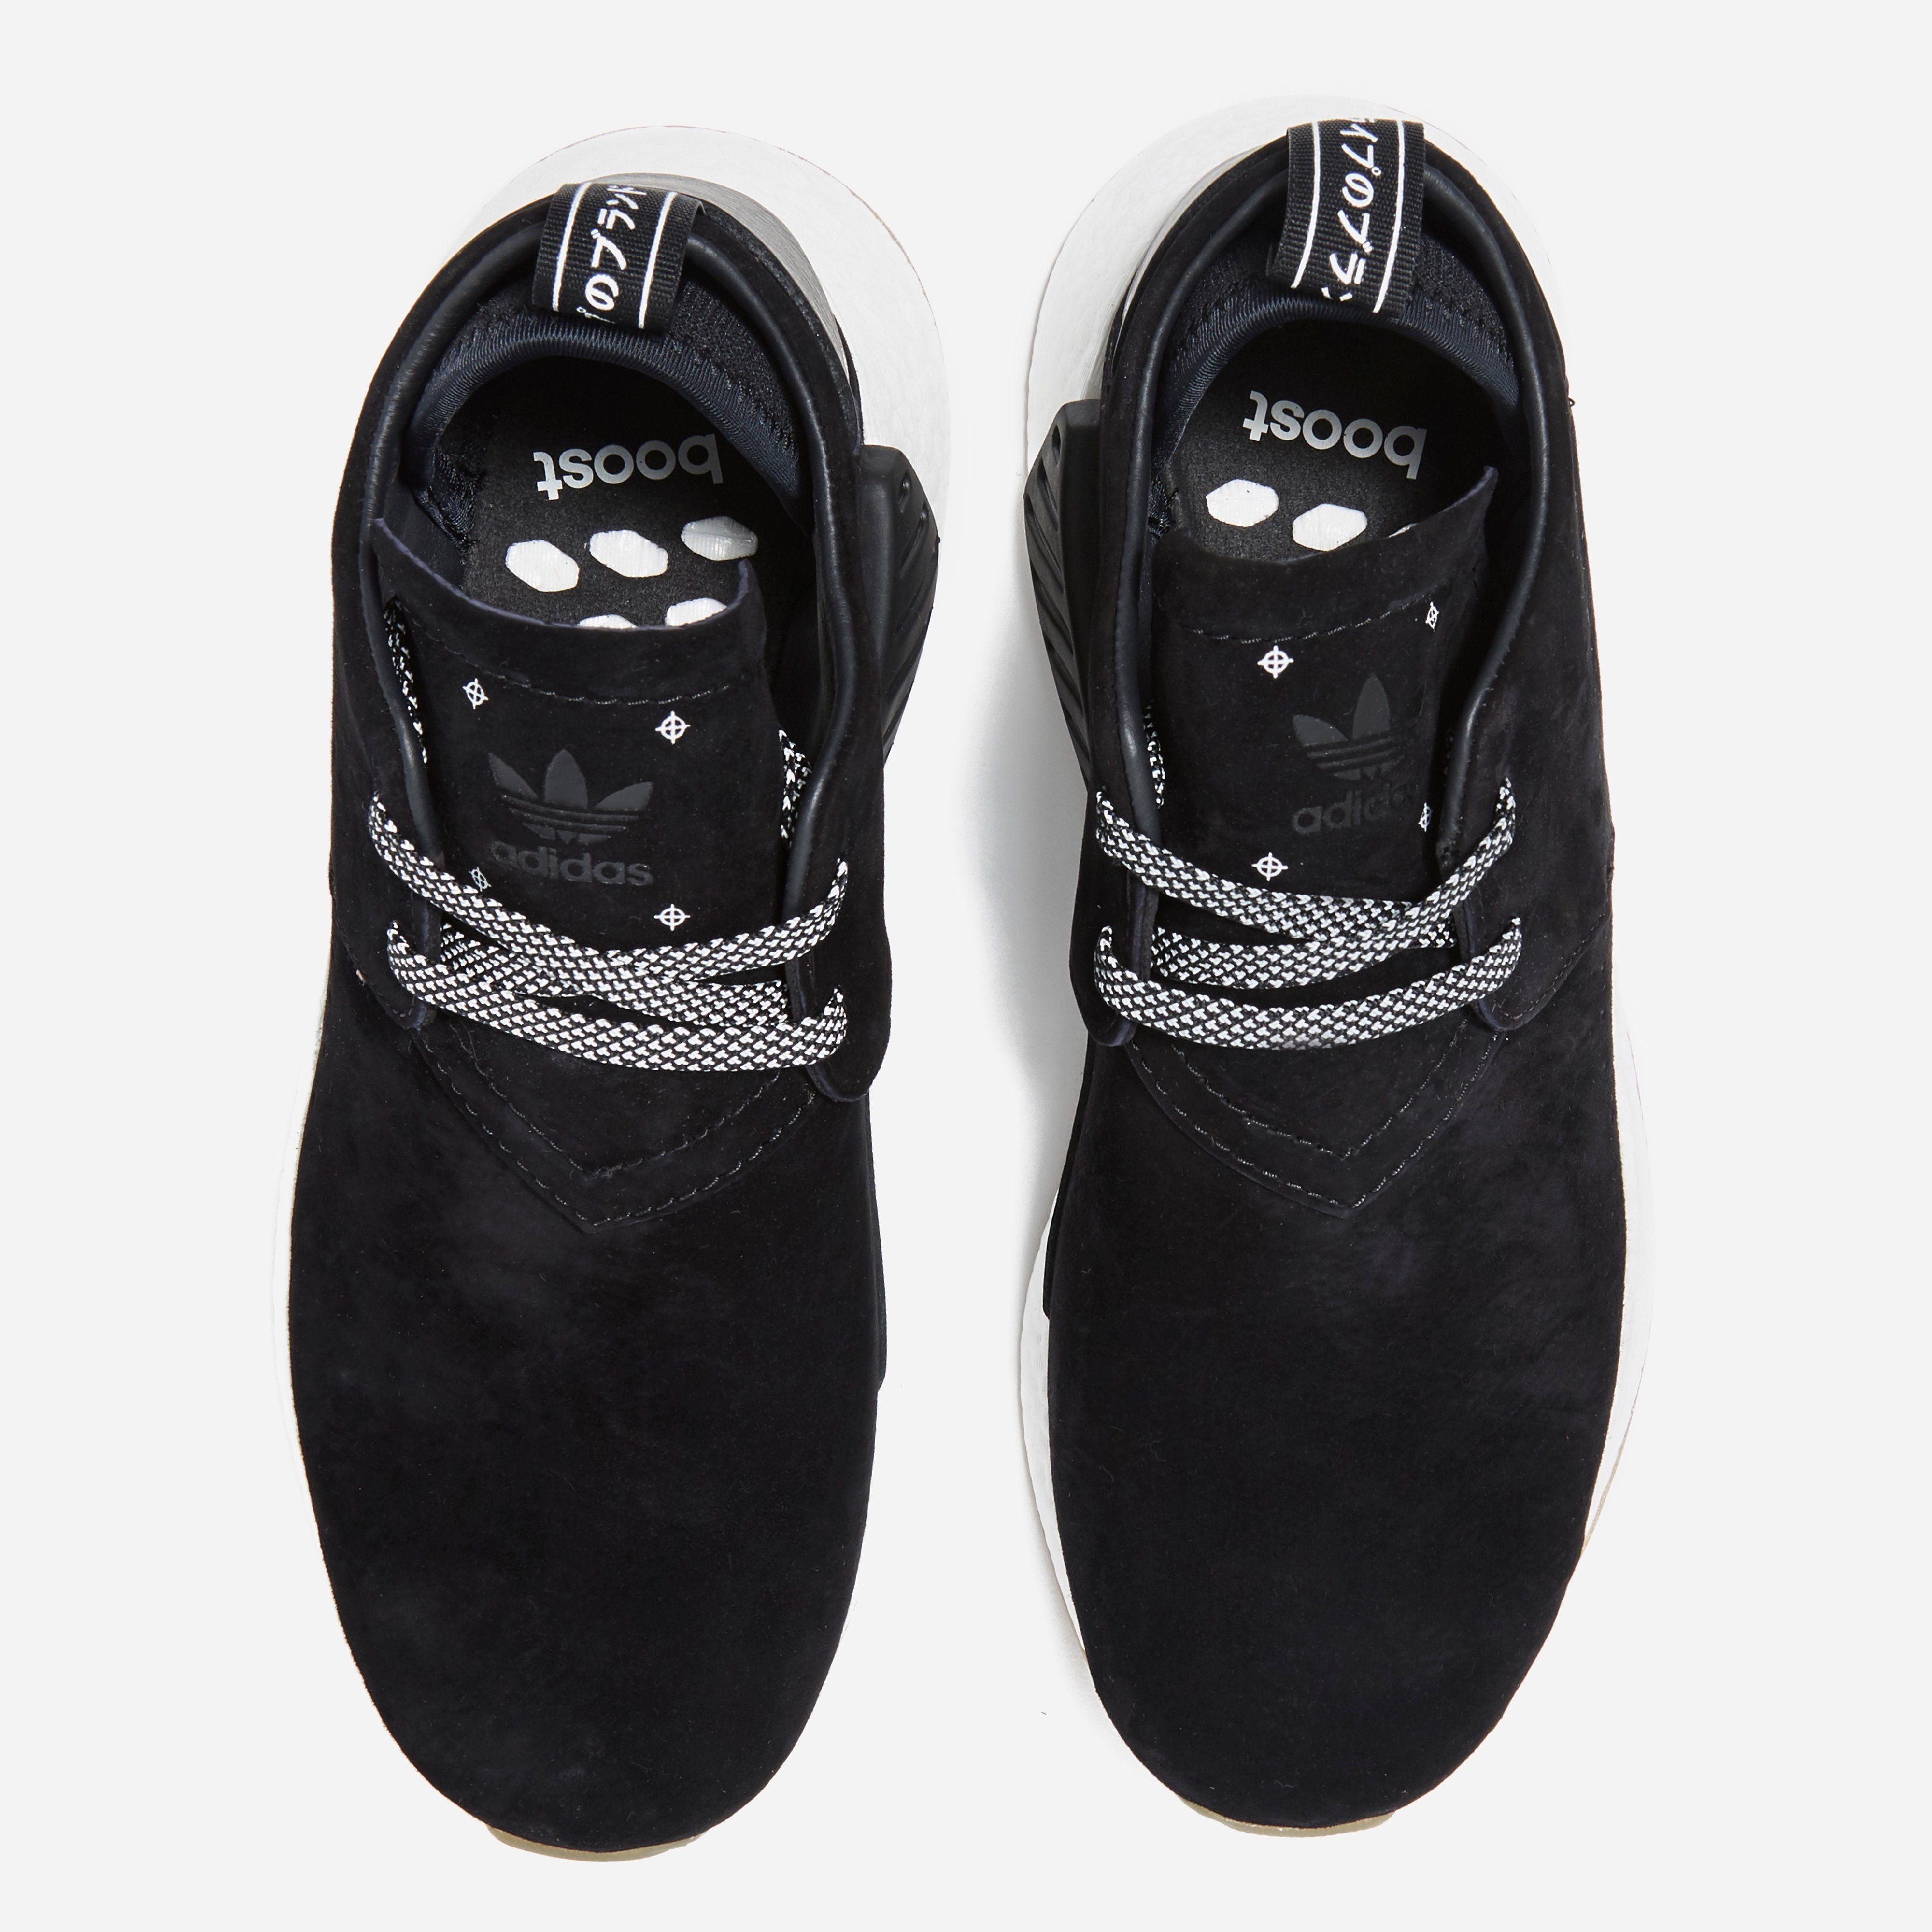 adidas Originals NMD C2